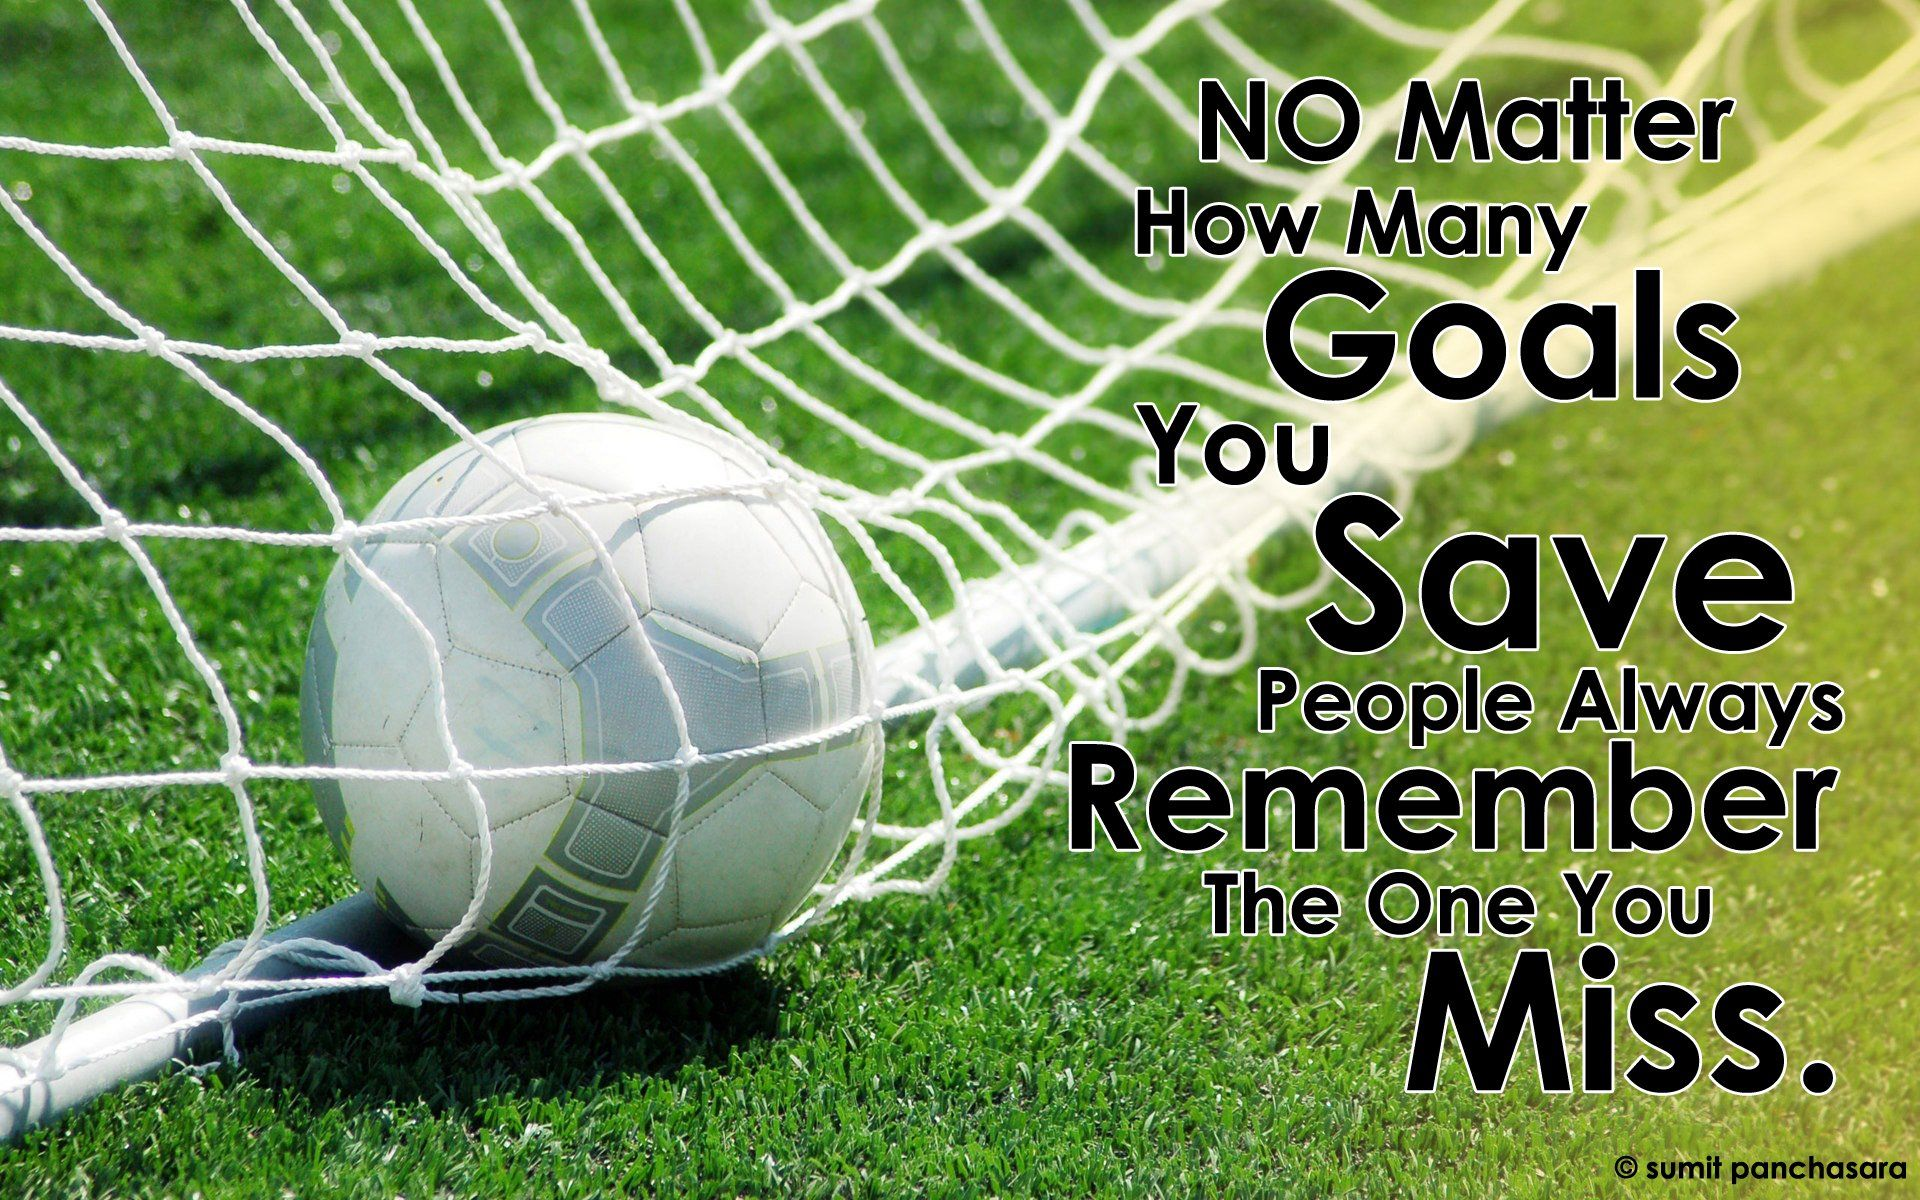 Goalkeeping soccer tips betting nj sports betting ruling the world